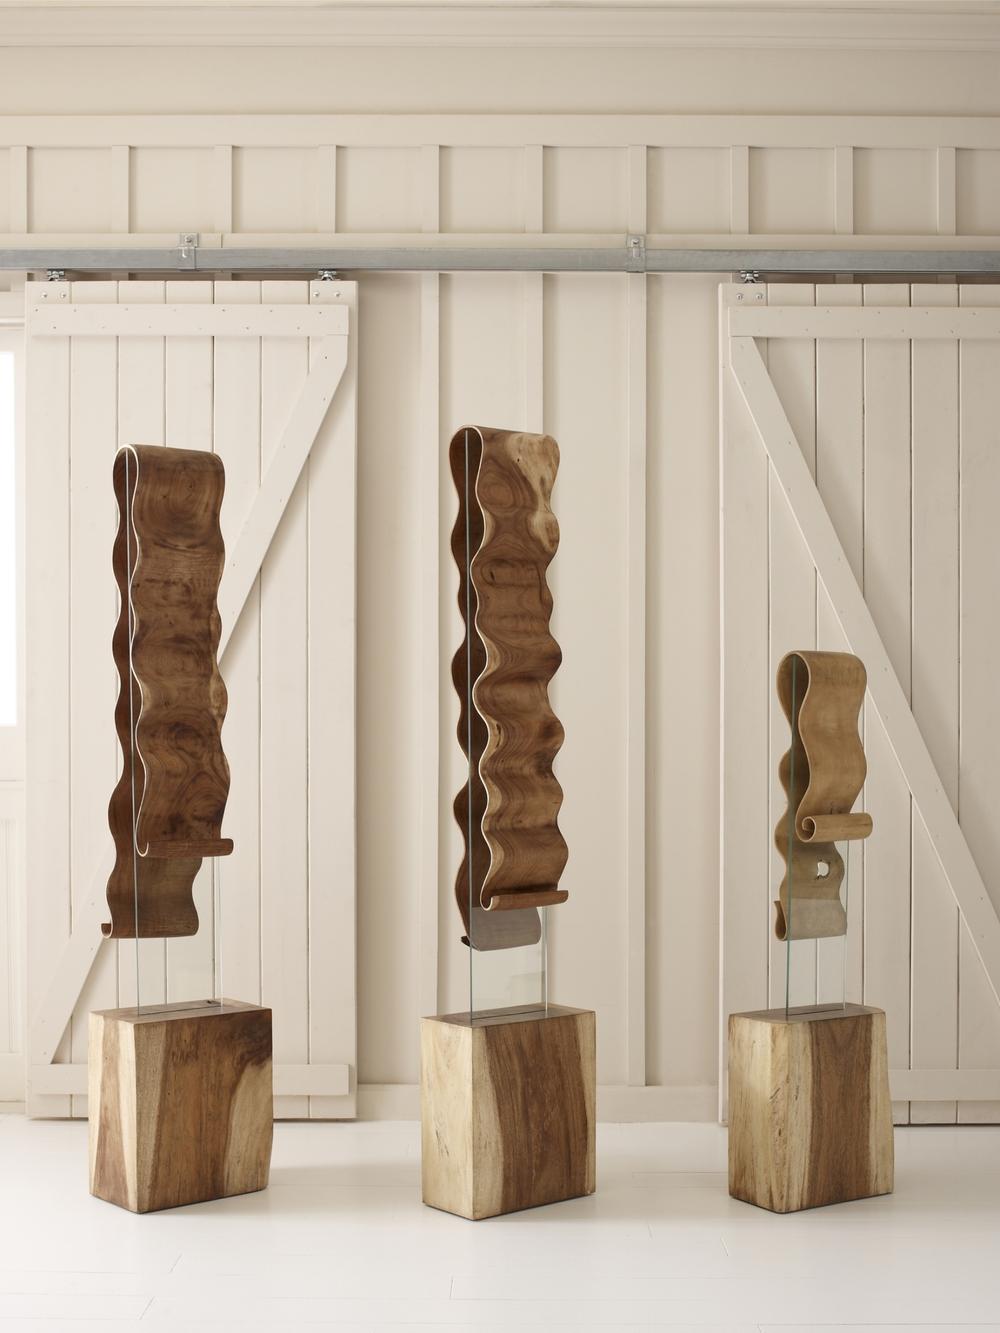 Asken Wood Shawl WINNER Mark Phillips, ASFD Phillips Collection